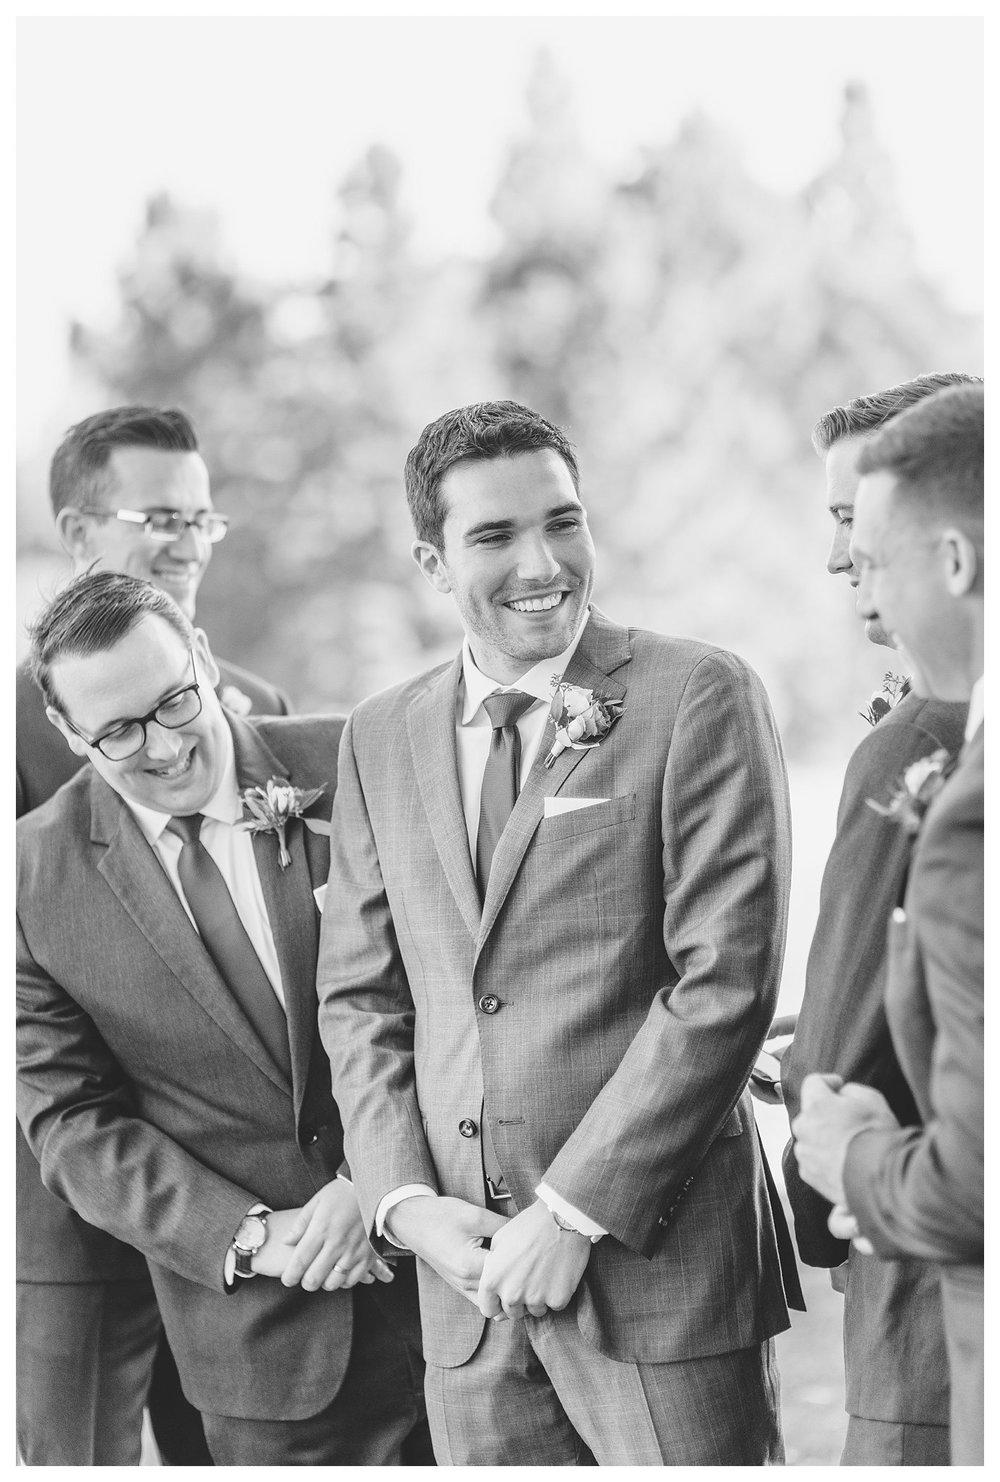 everleighphotography-cincinnati-wedding-photographer-northern-kentucky-wedding-photographer-camargo-country-club-the-karsh-wedding-26